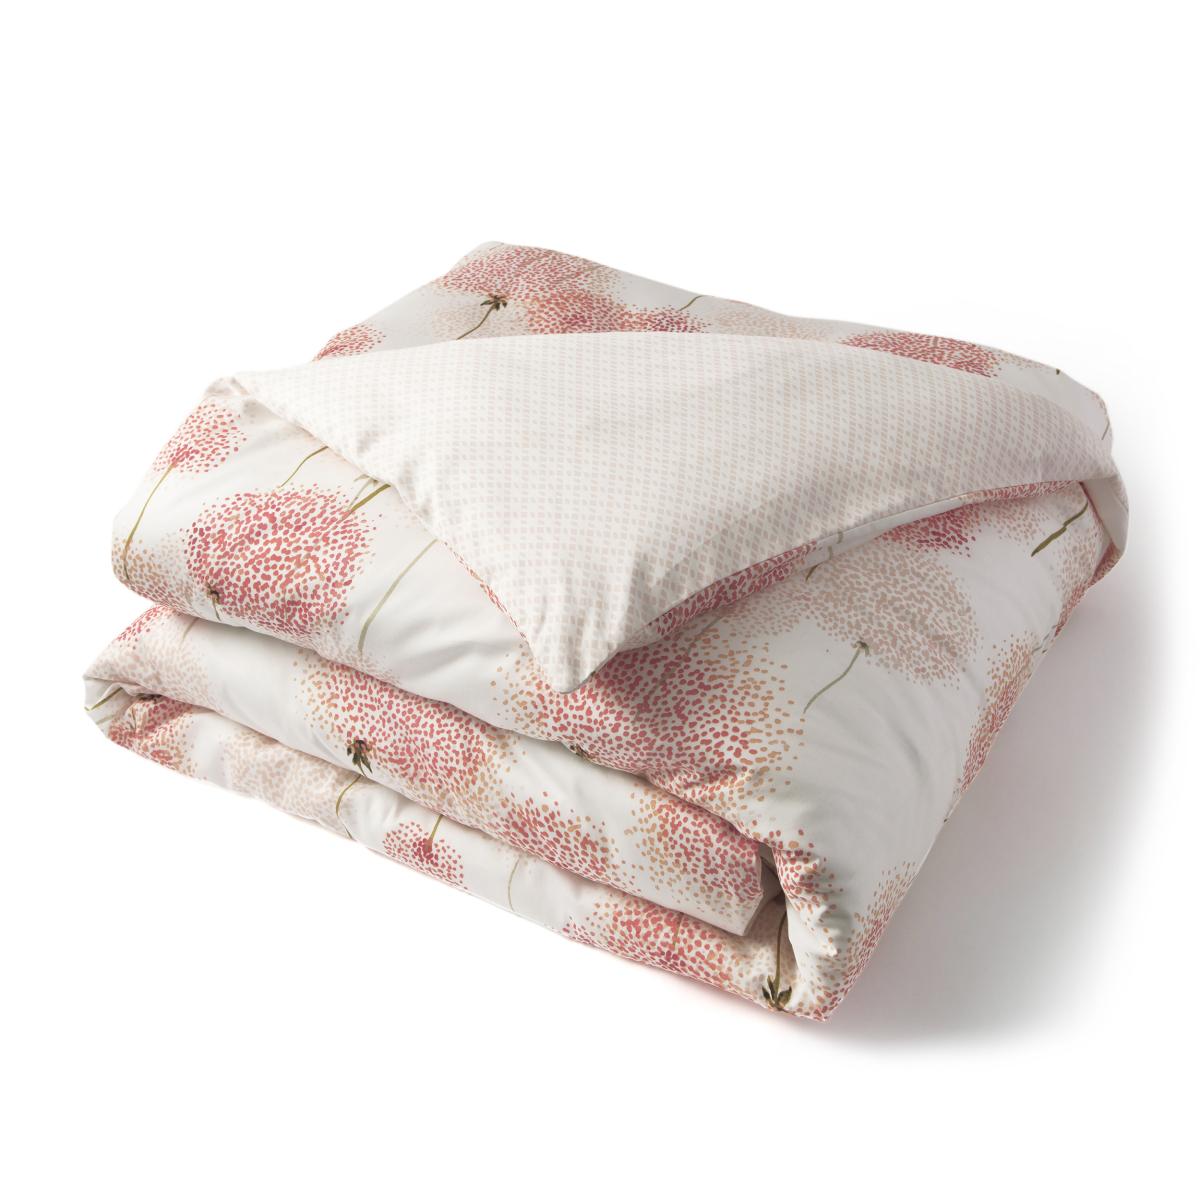 Evanescence Bed Linen Set French Linen House Tradition Des Vosges